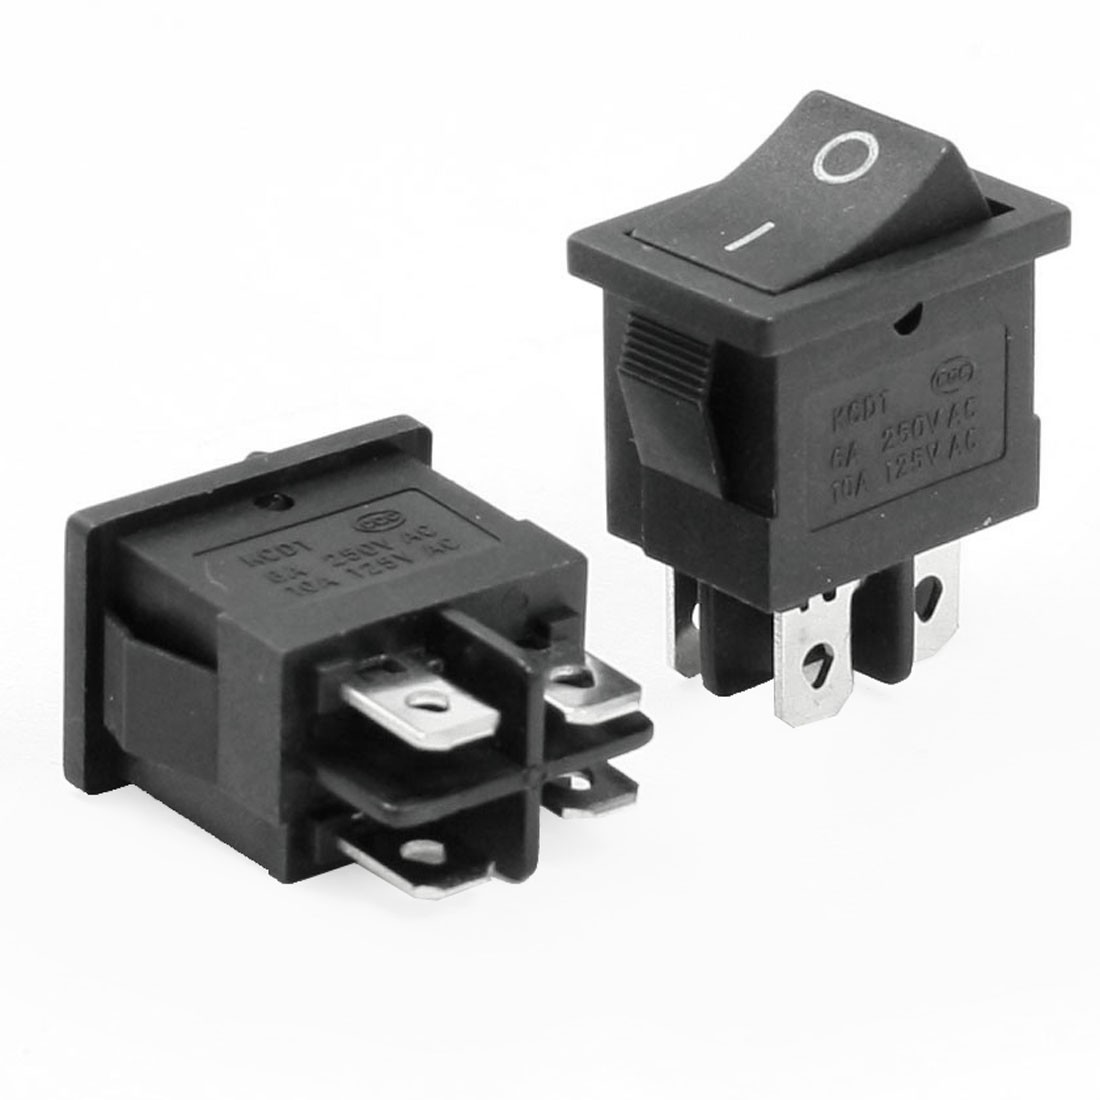 AC 250V 6A 125V 10A 4 Pins DPST On-Off Rocker Switch Black 2 Pcs